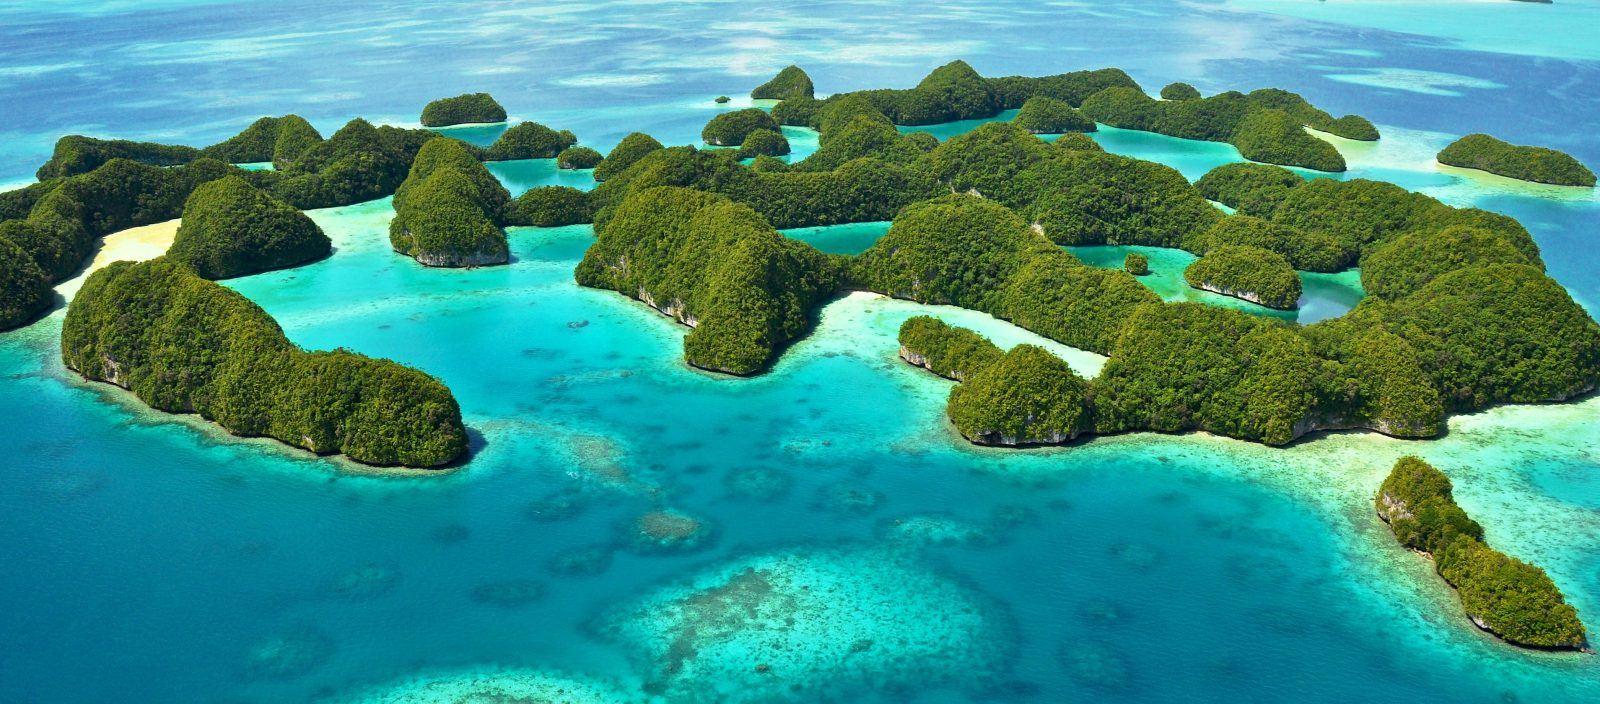 Palau: Snorkelling and Kayaking the Pristine Seas